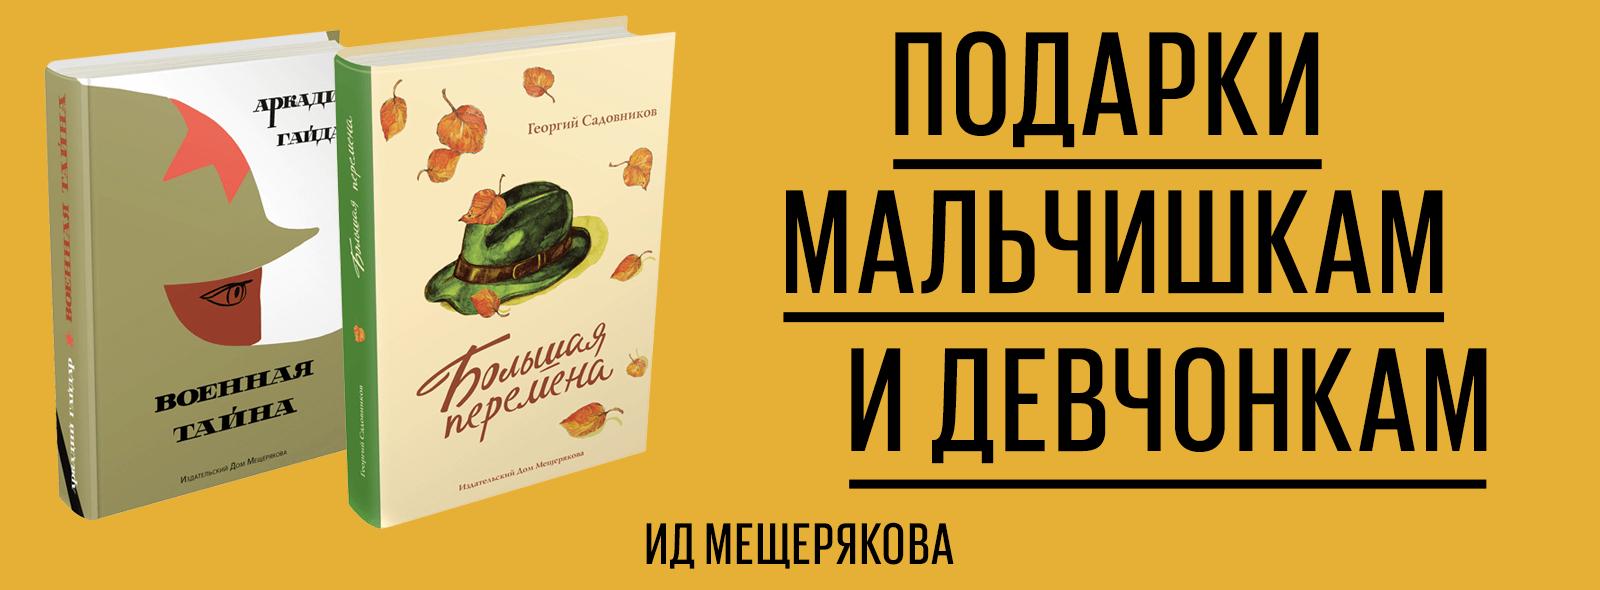 ИД Мещерякова дарит книги